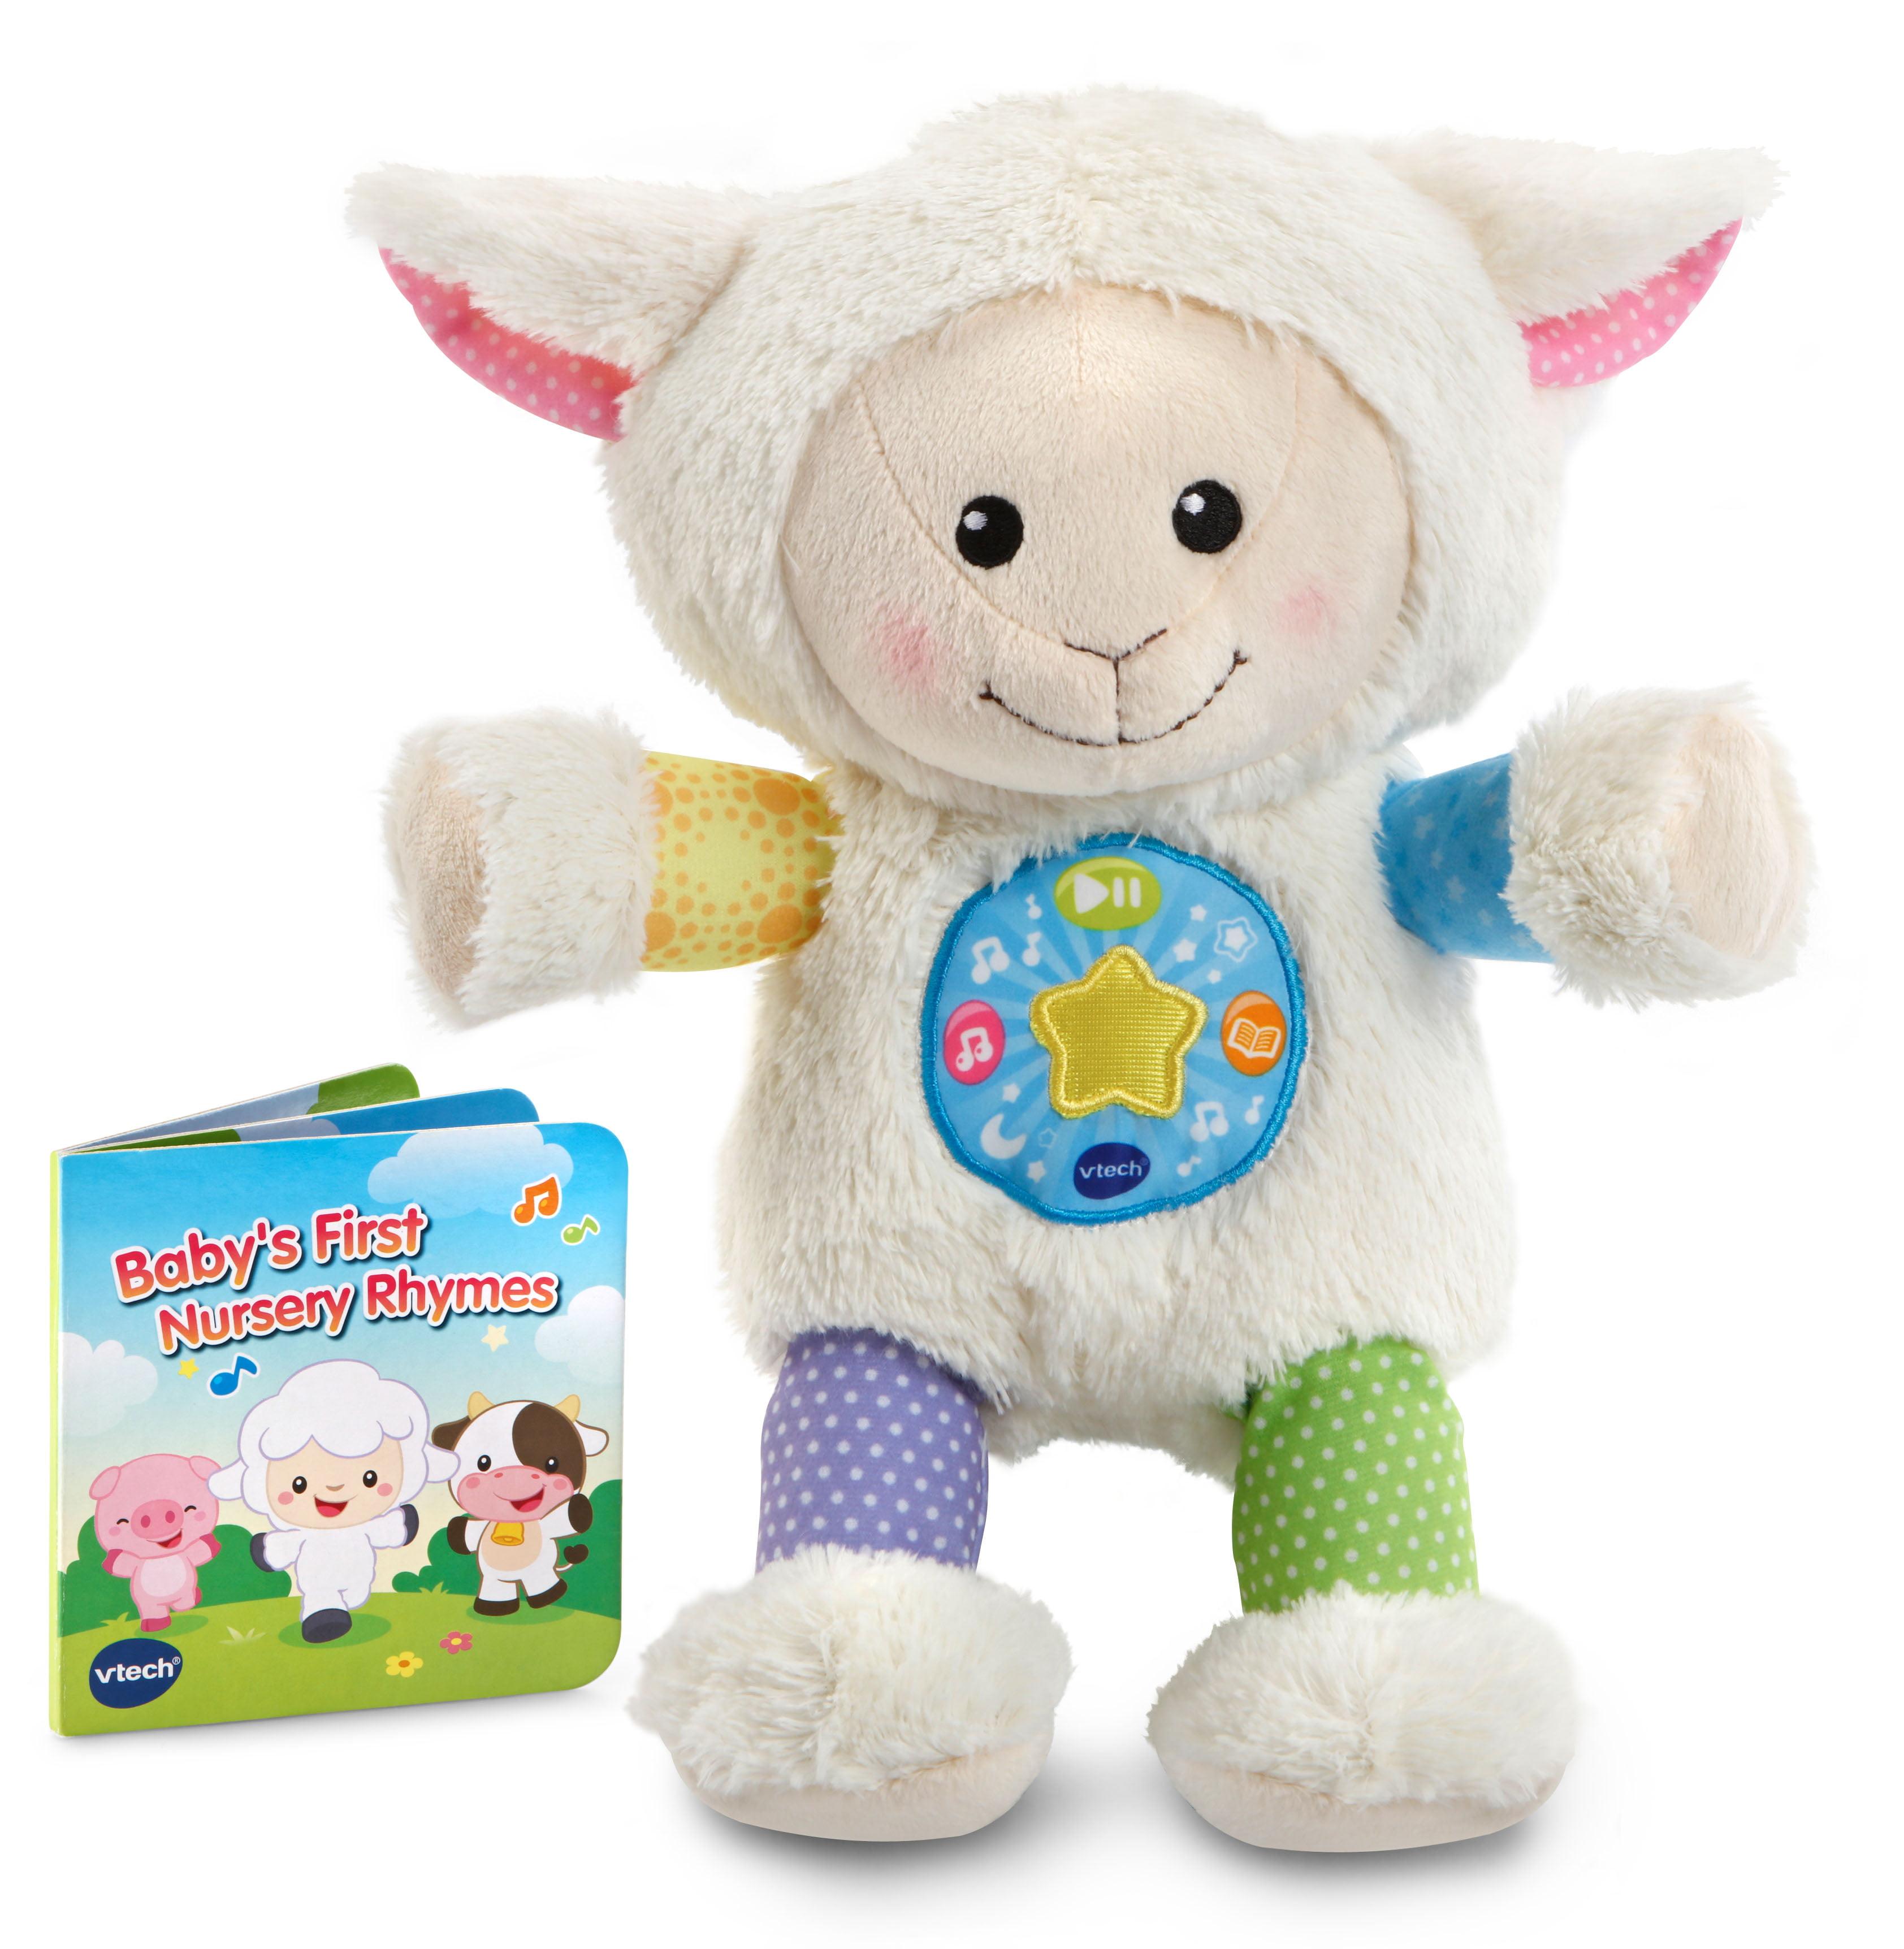 7c7bc02afb6 VTech Storytime Rhymes Sheep - Walmart.com